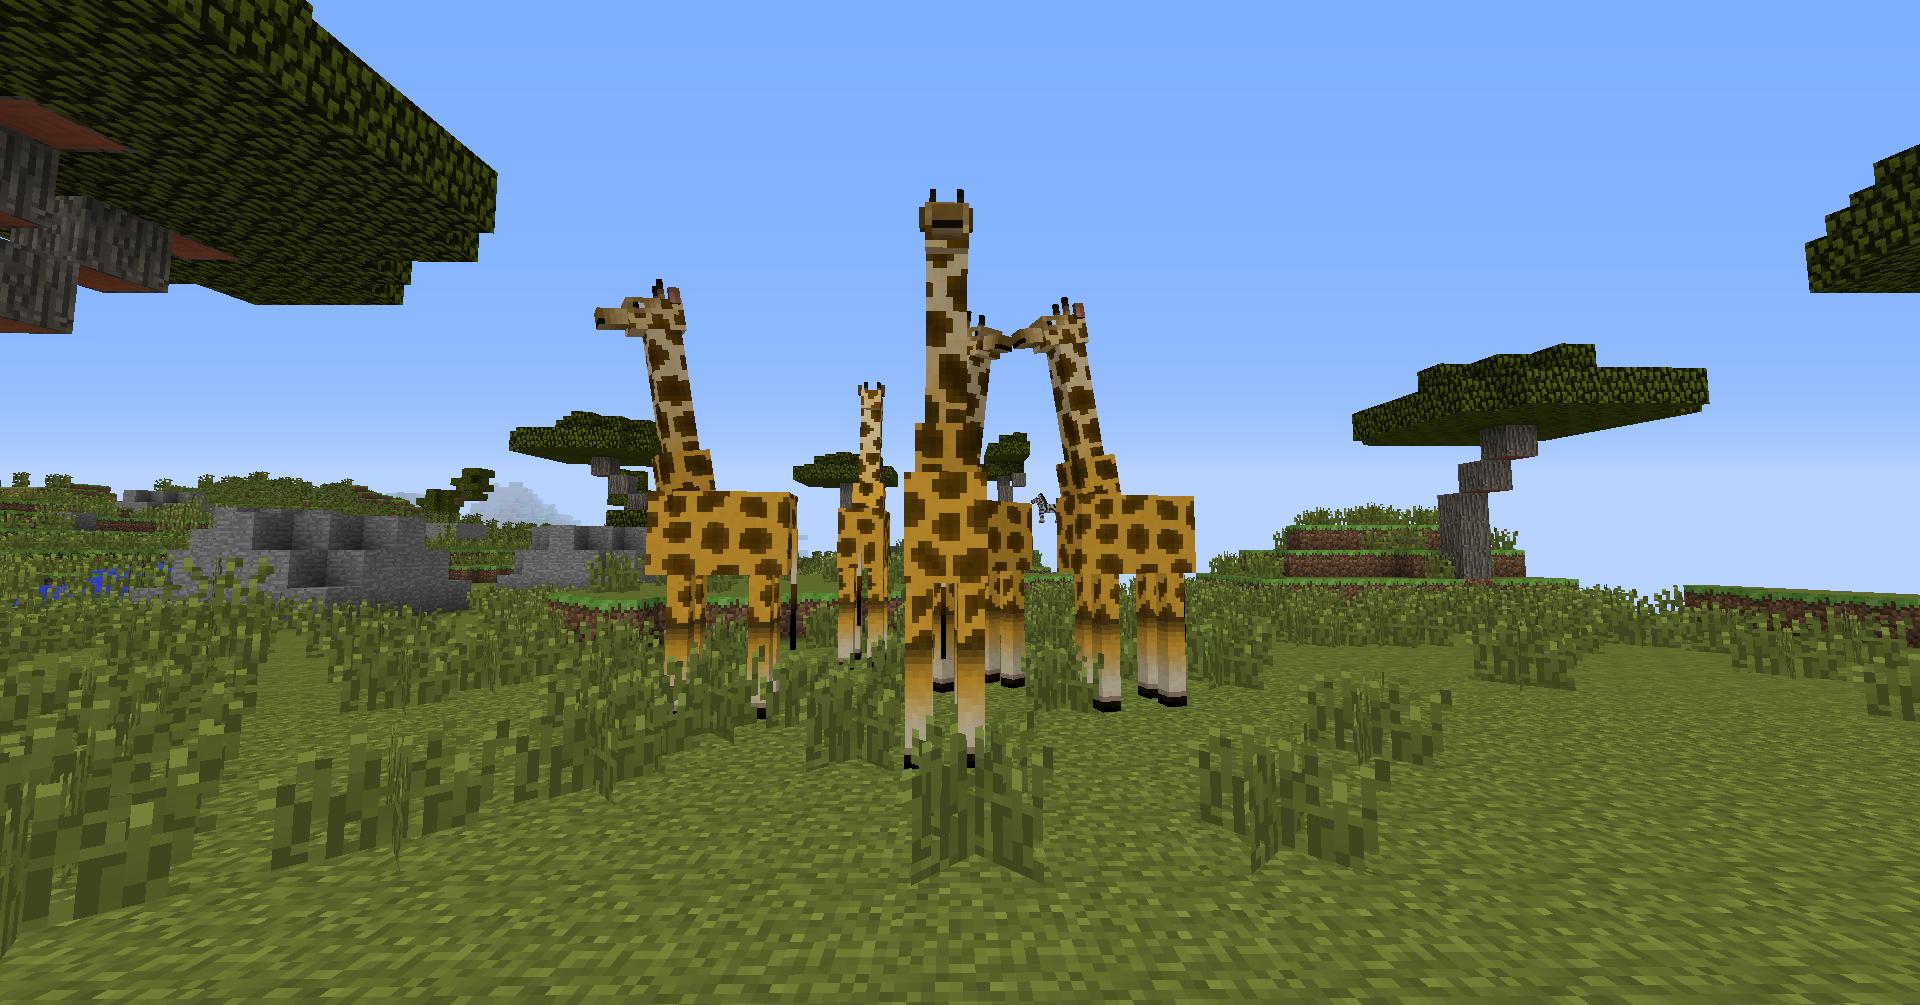 Giraffe | The Lord of the Rings Minecraft Mod Wiki | Fandom